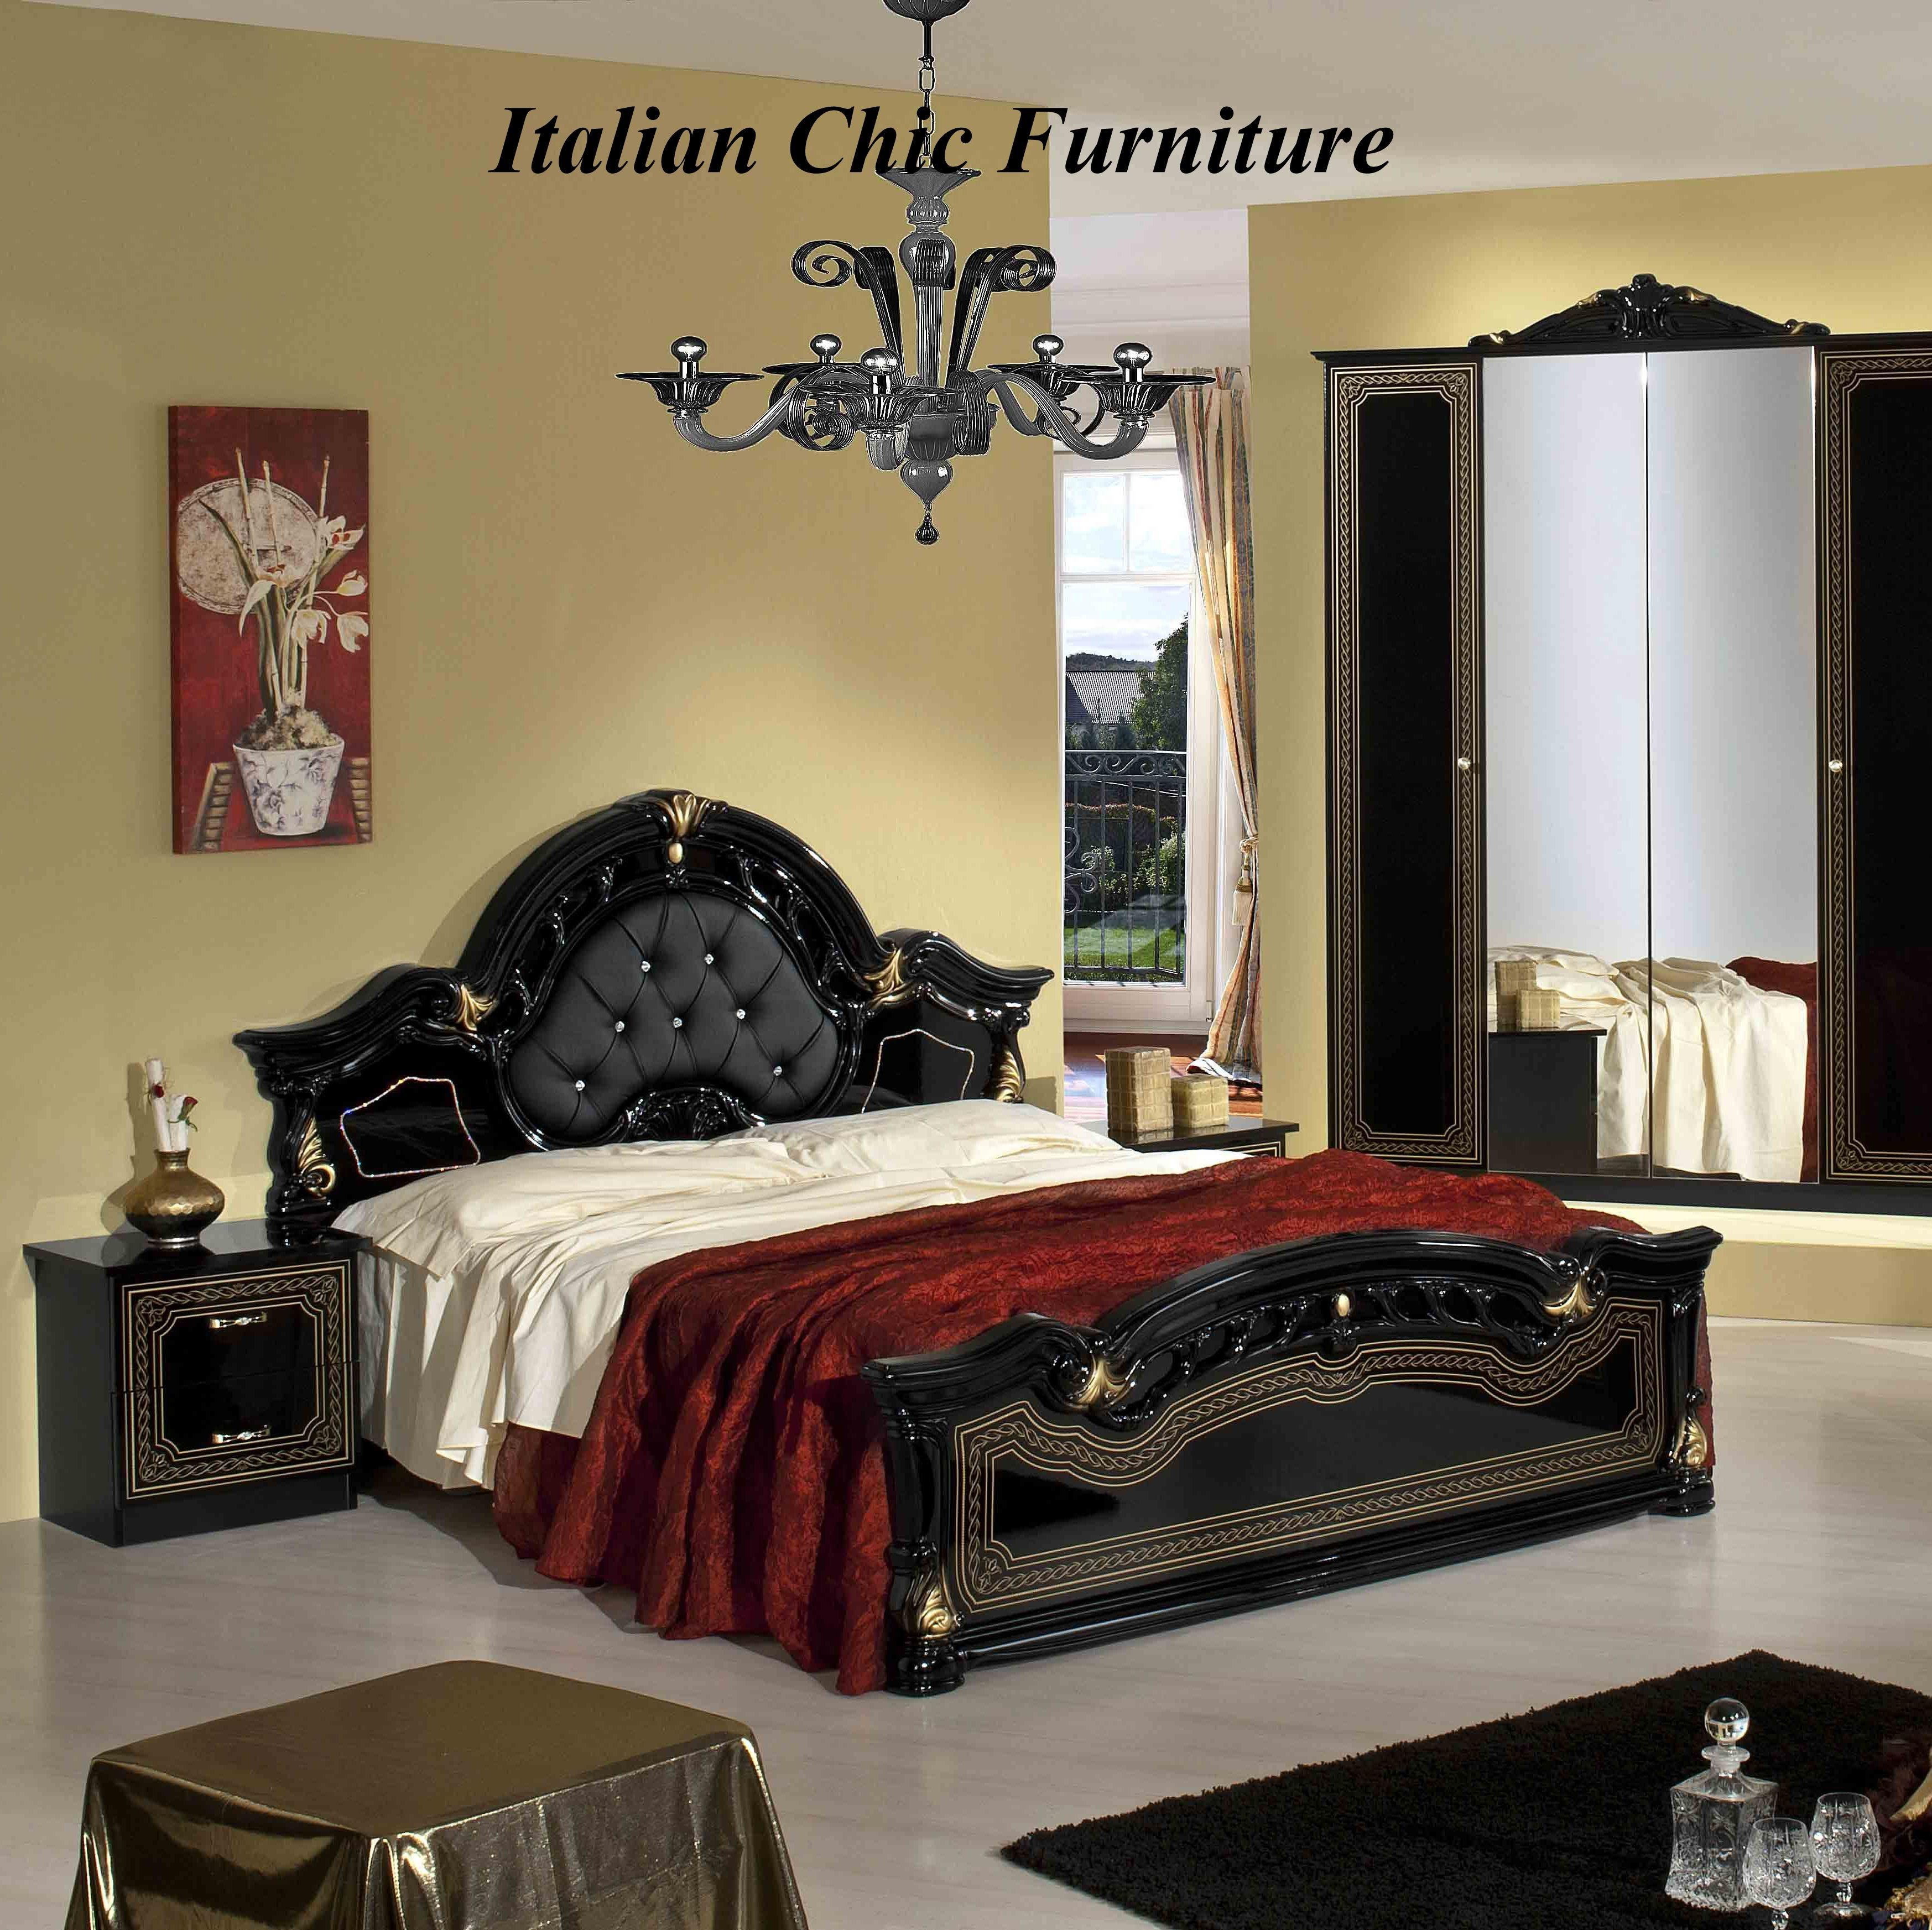 Stella Black & Gold Bedroom Set with 4 Door Wardrobe. From